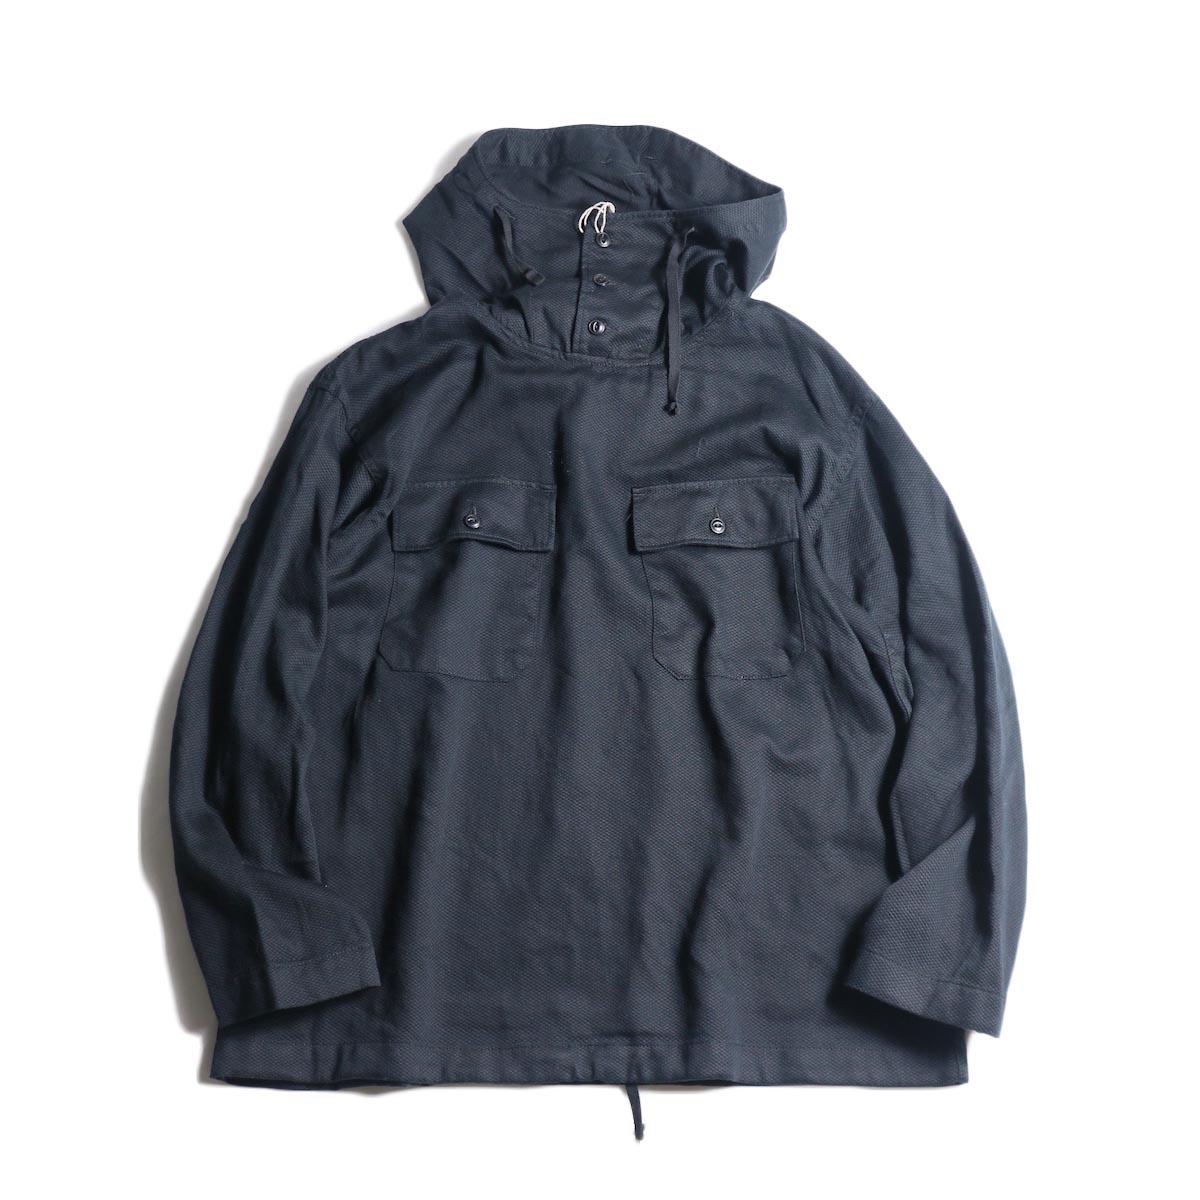 Engineered Garments / Cagoule Shirt -Waffle Pique (Black)